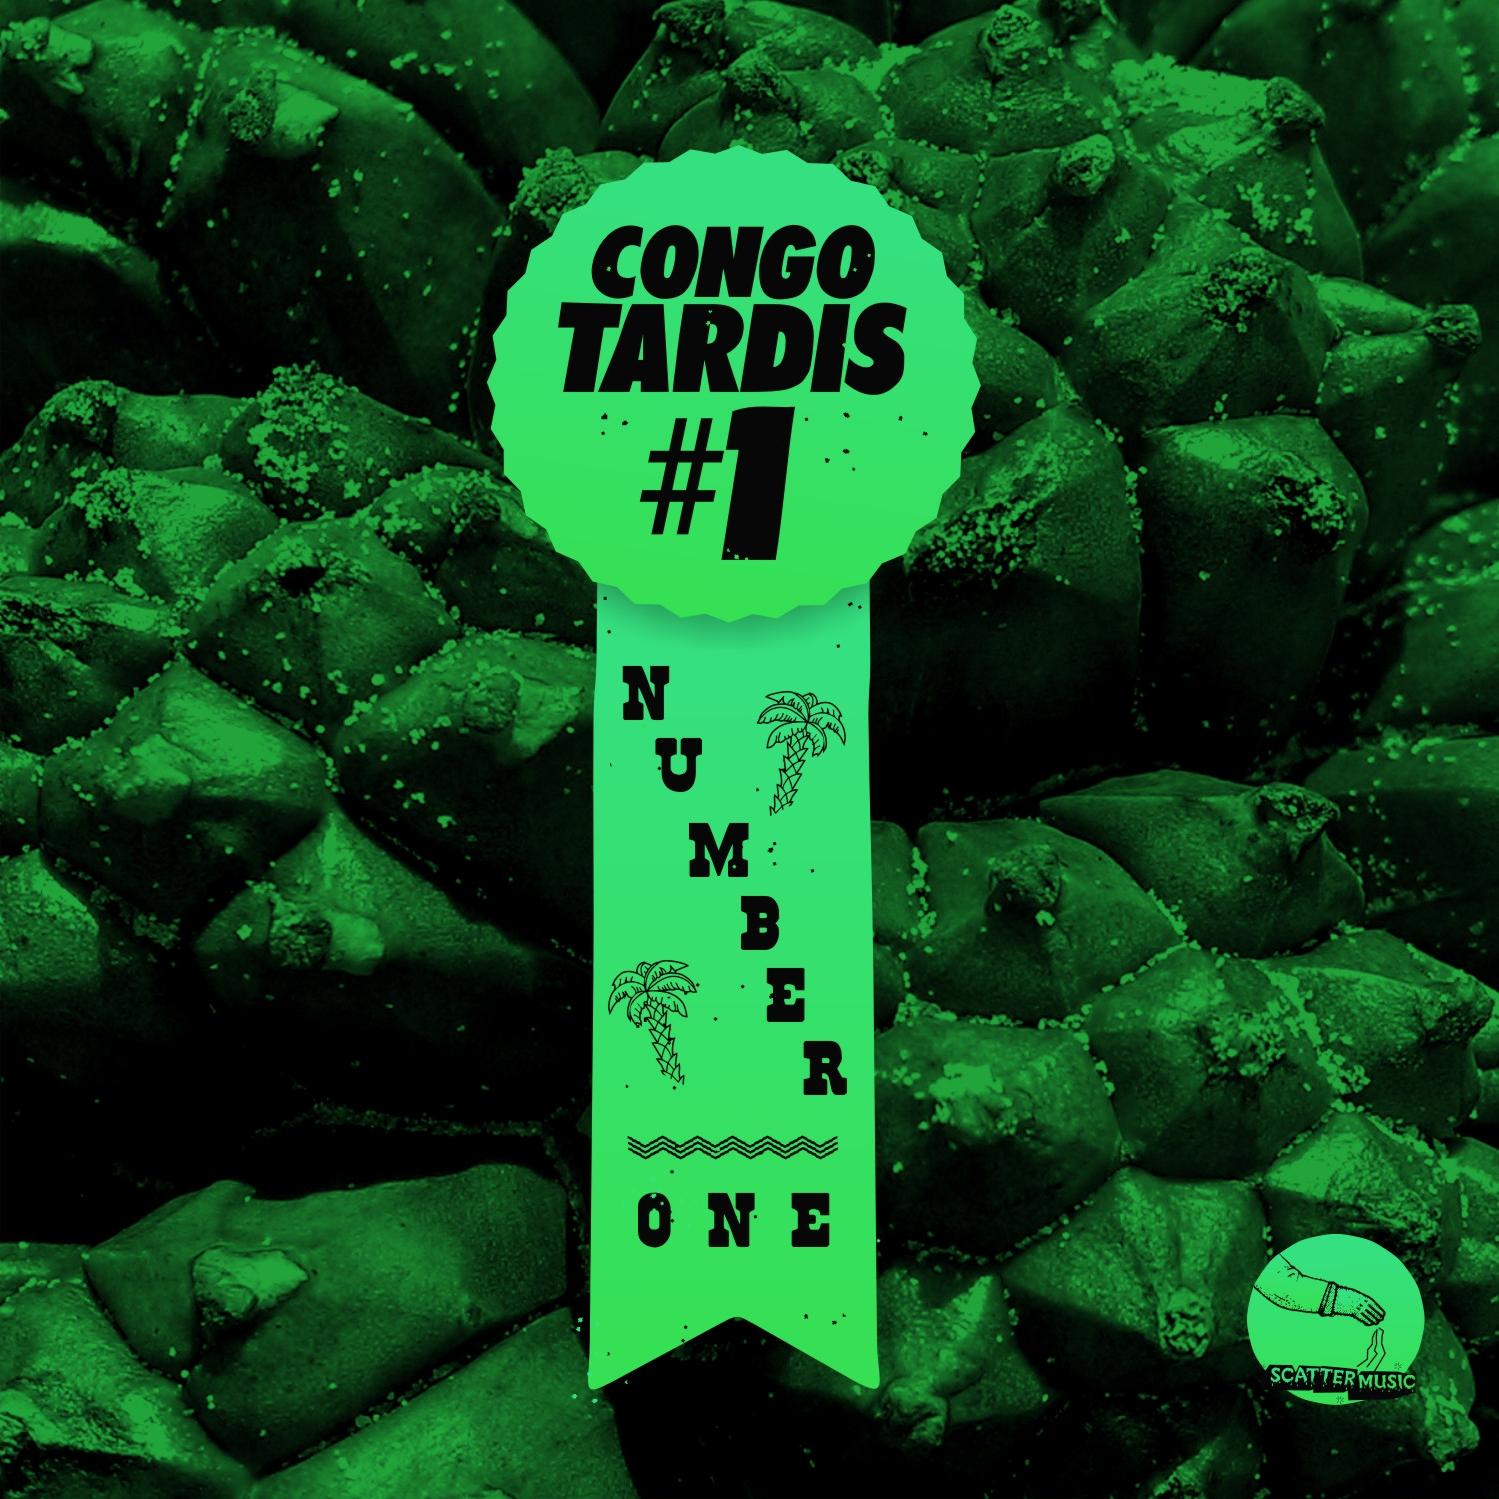 CONGO TARDIS #1 - NUMBER ONE EP - SCATTERMUSIC - 2012